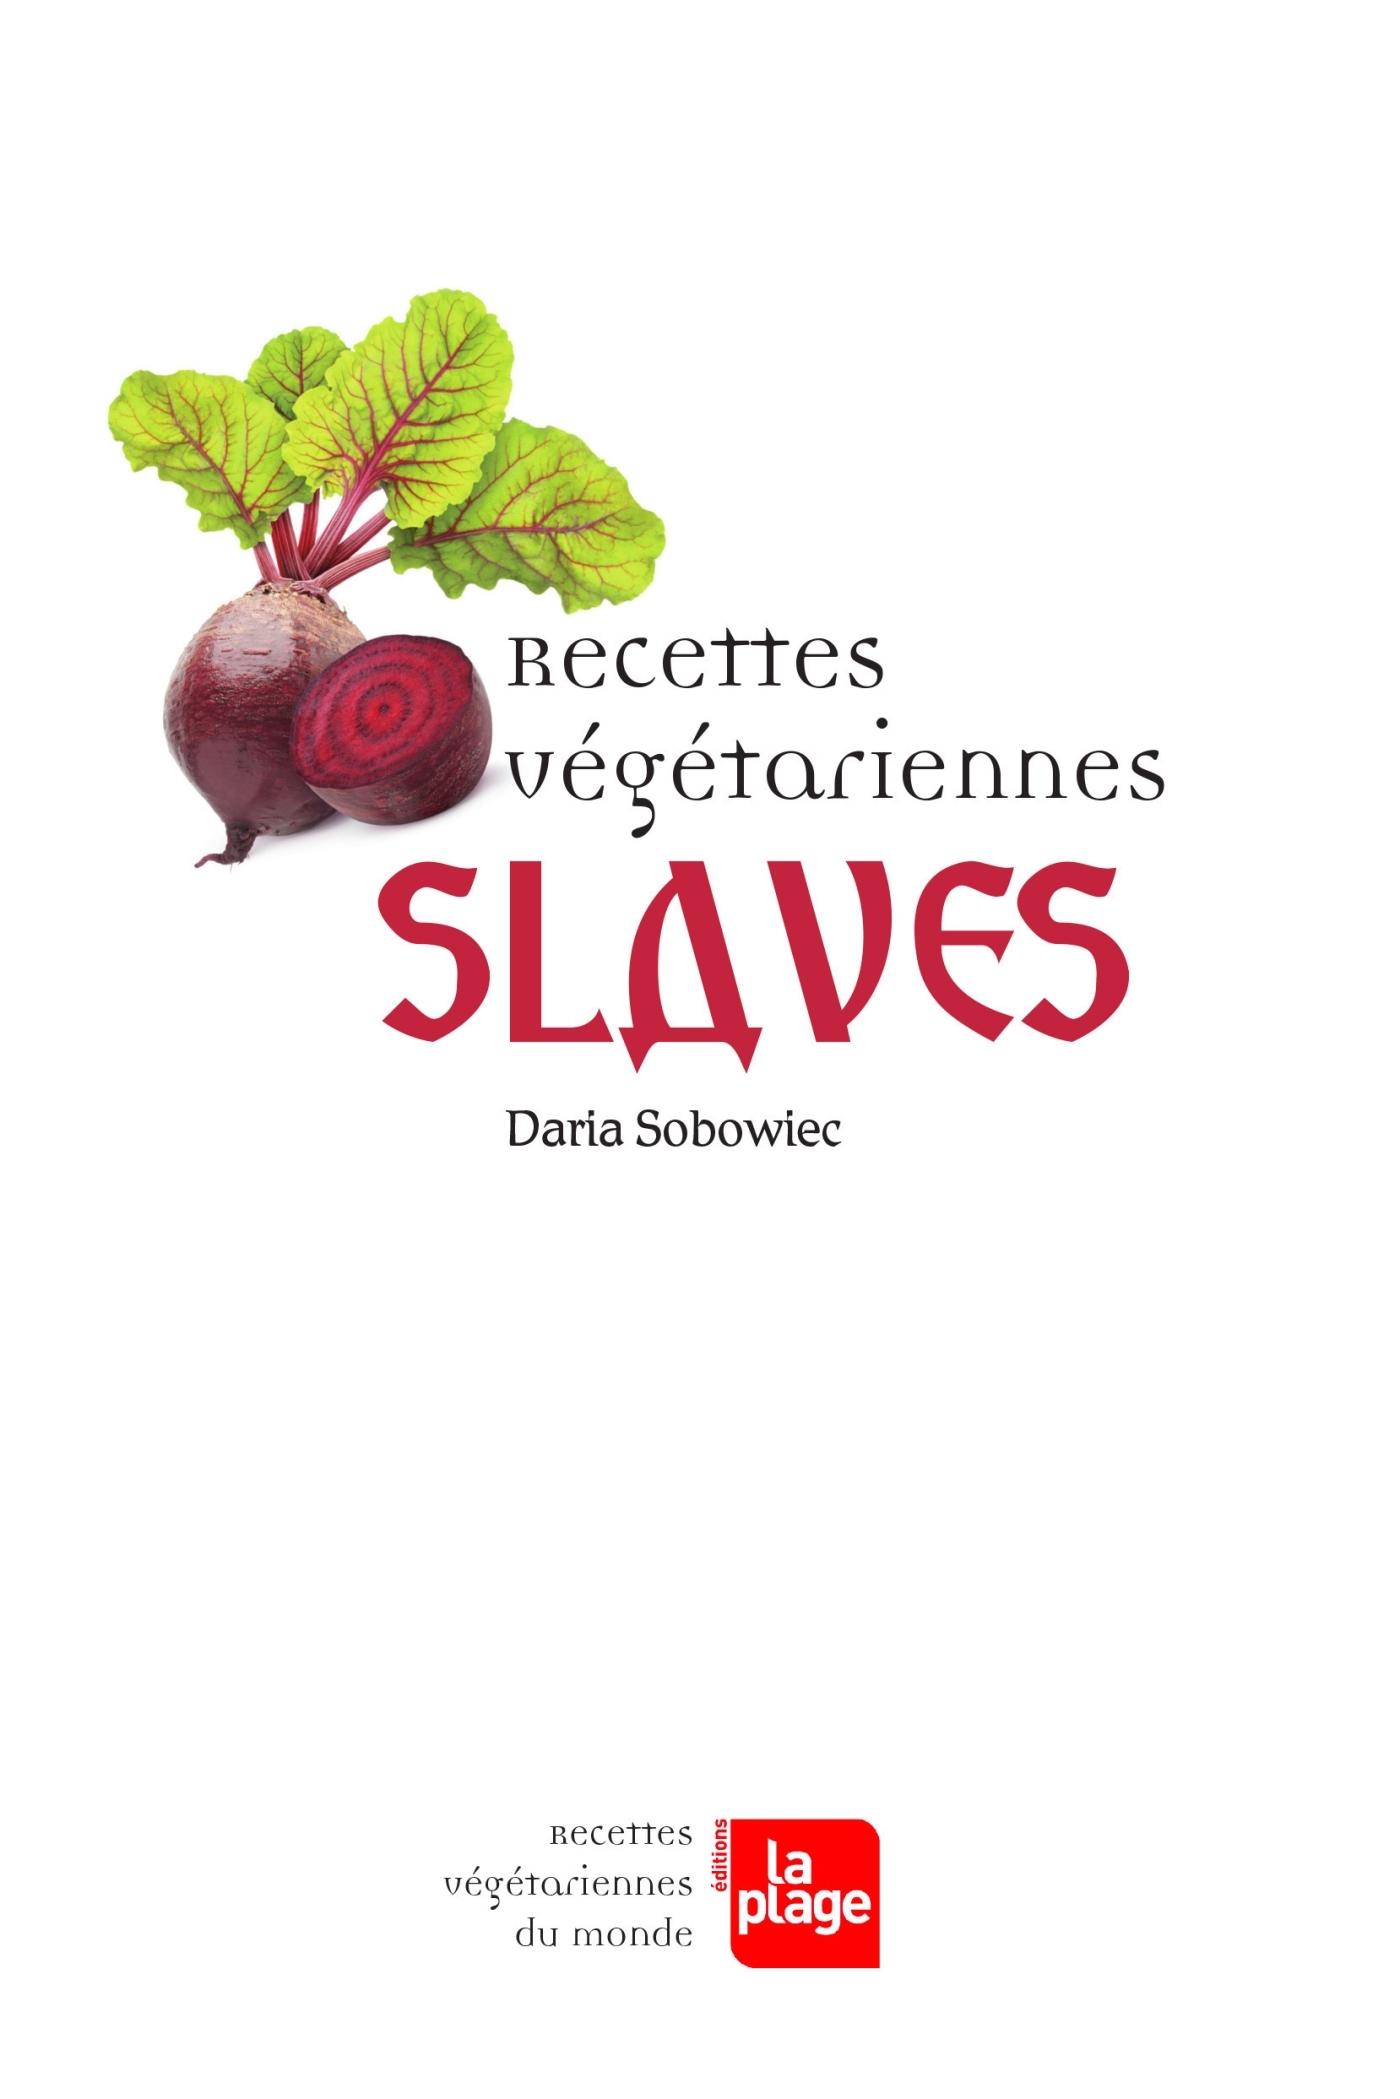 RECETTES VEGETARIENNES SLAVES